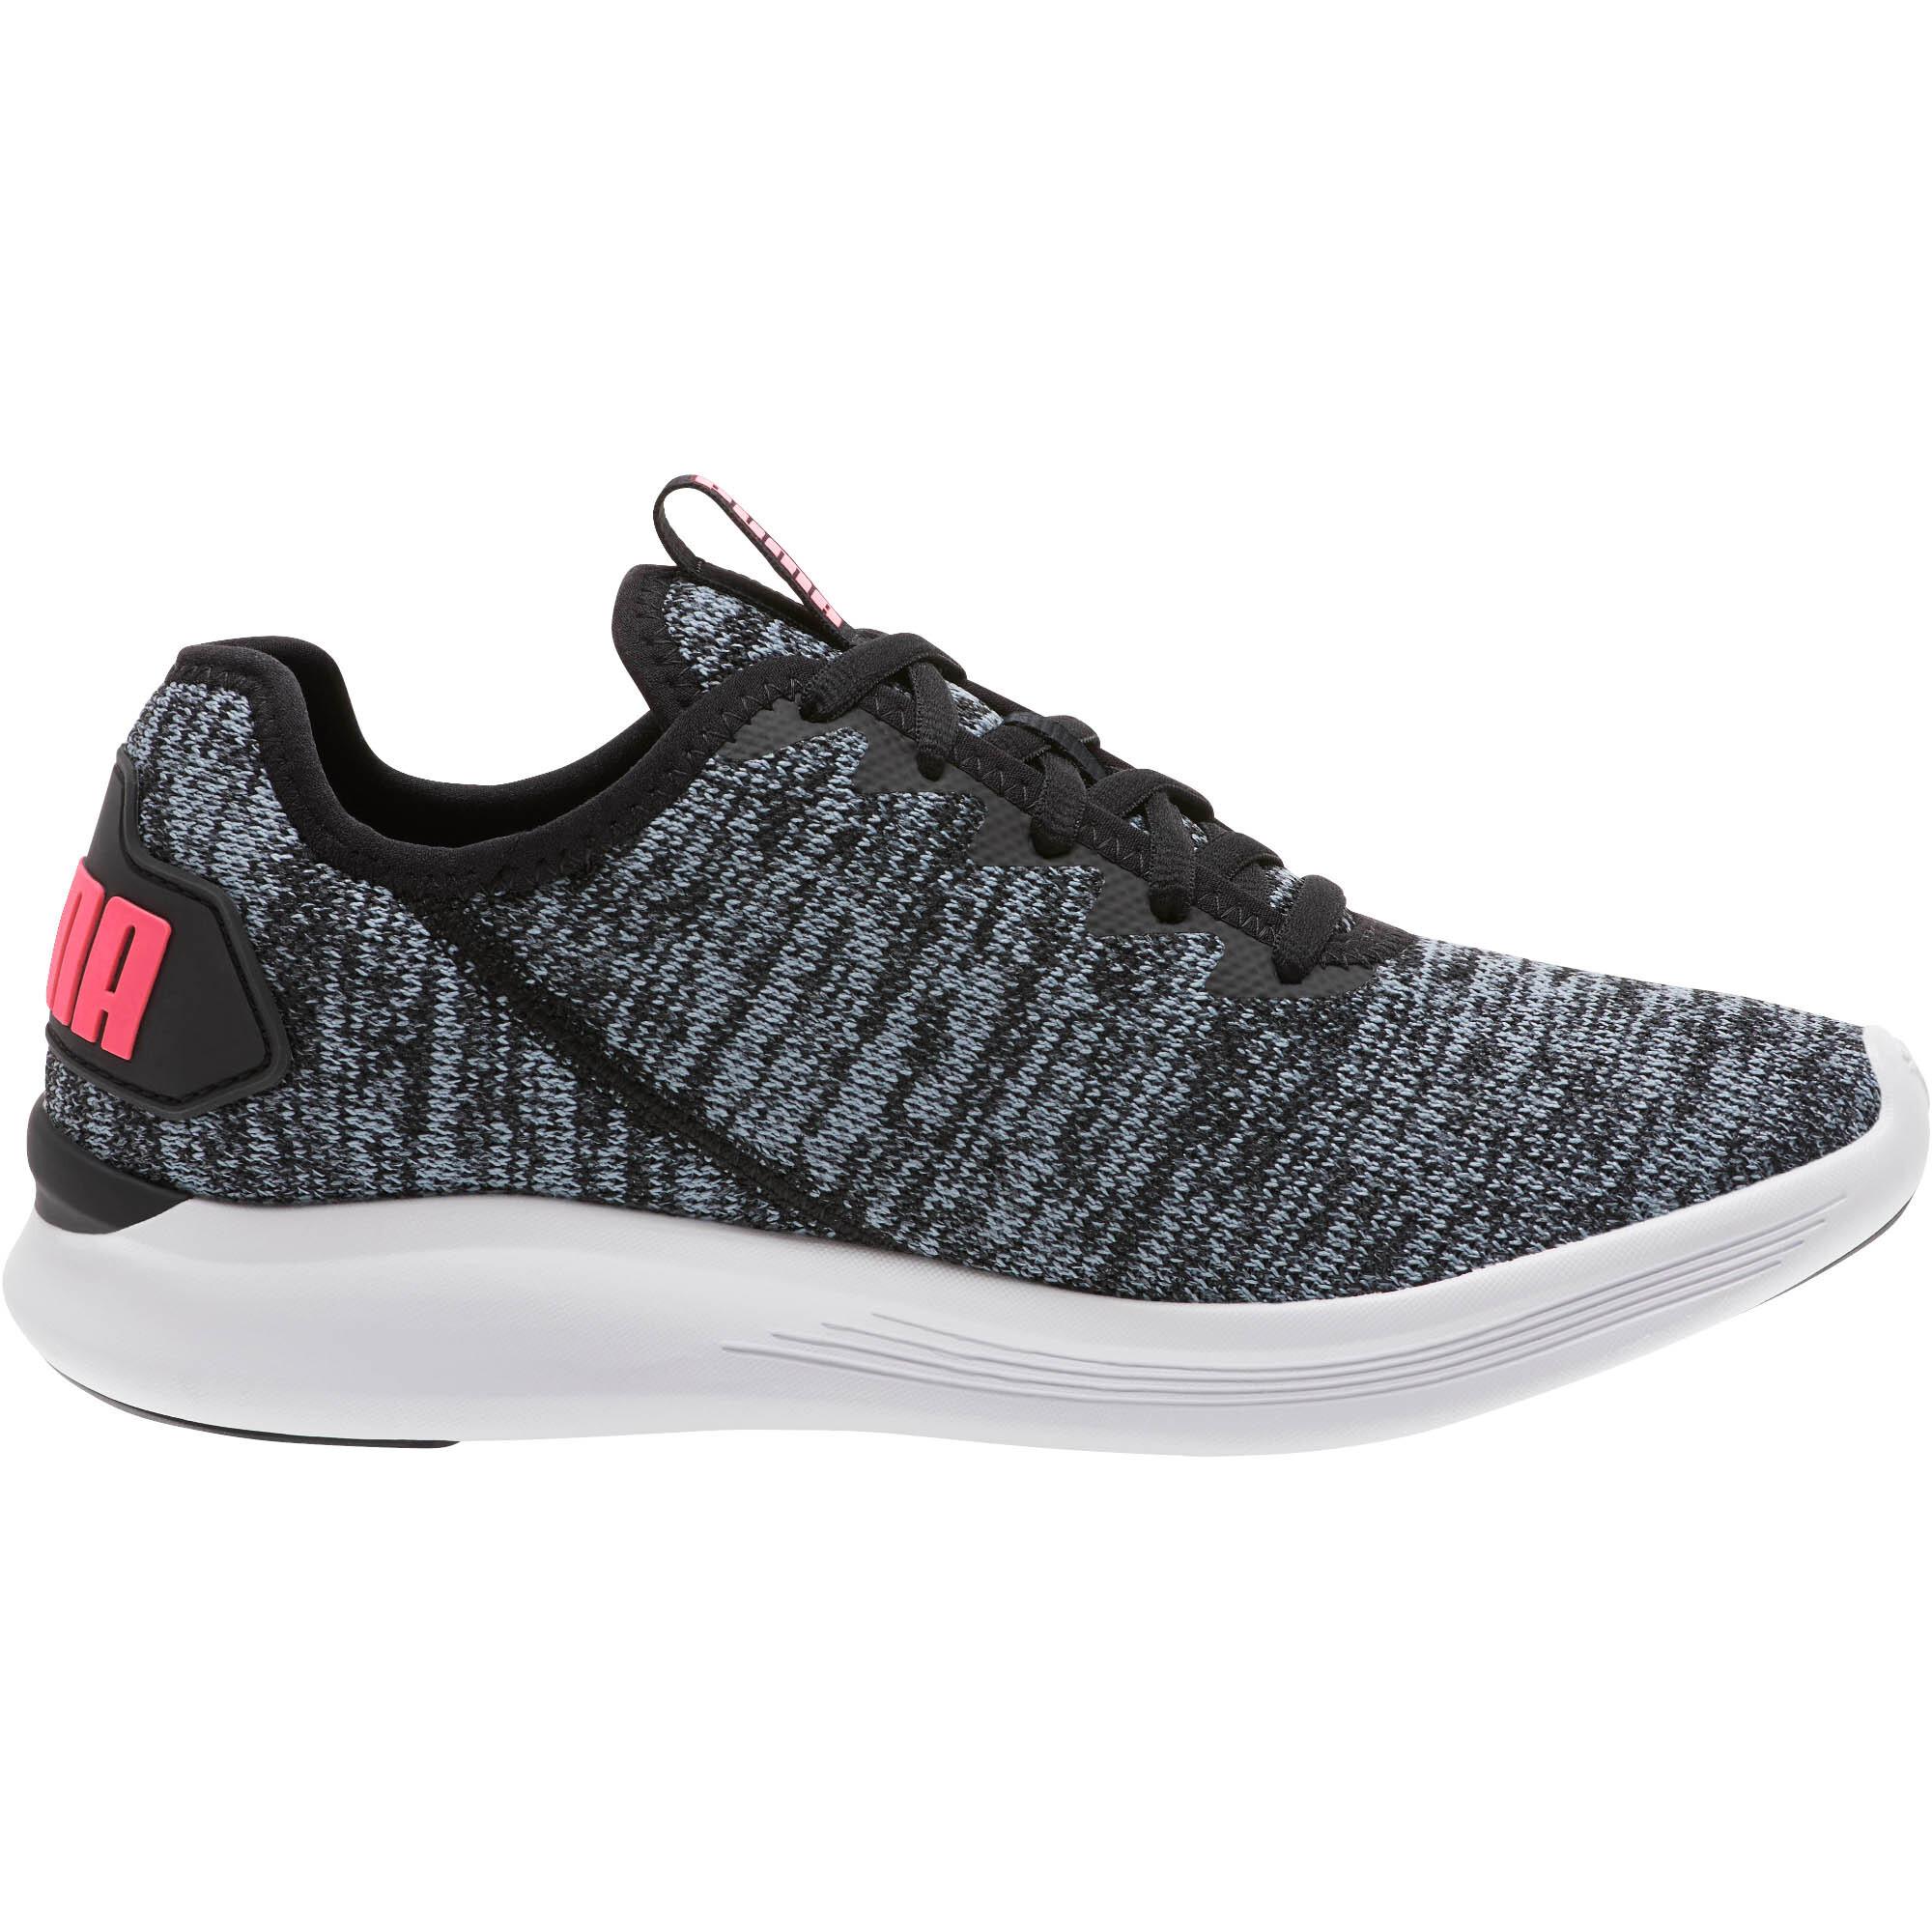 PUMA-Ballast-Women-039-s-Running-Shoes-Women-Shoe-Running thumbnail 10